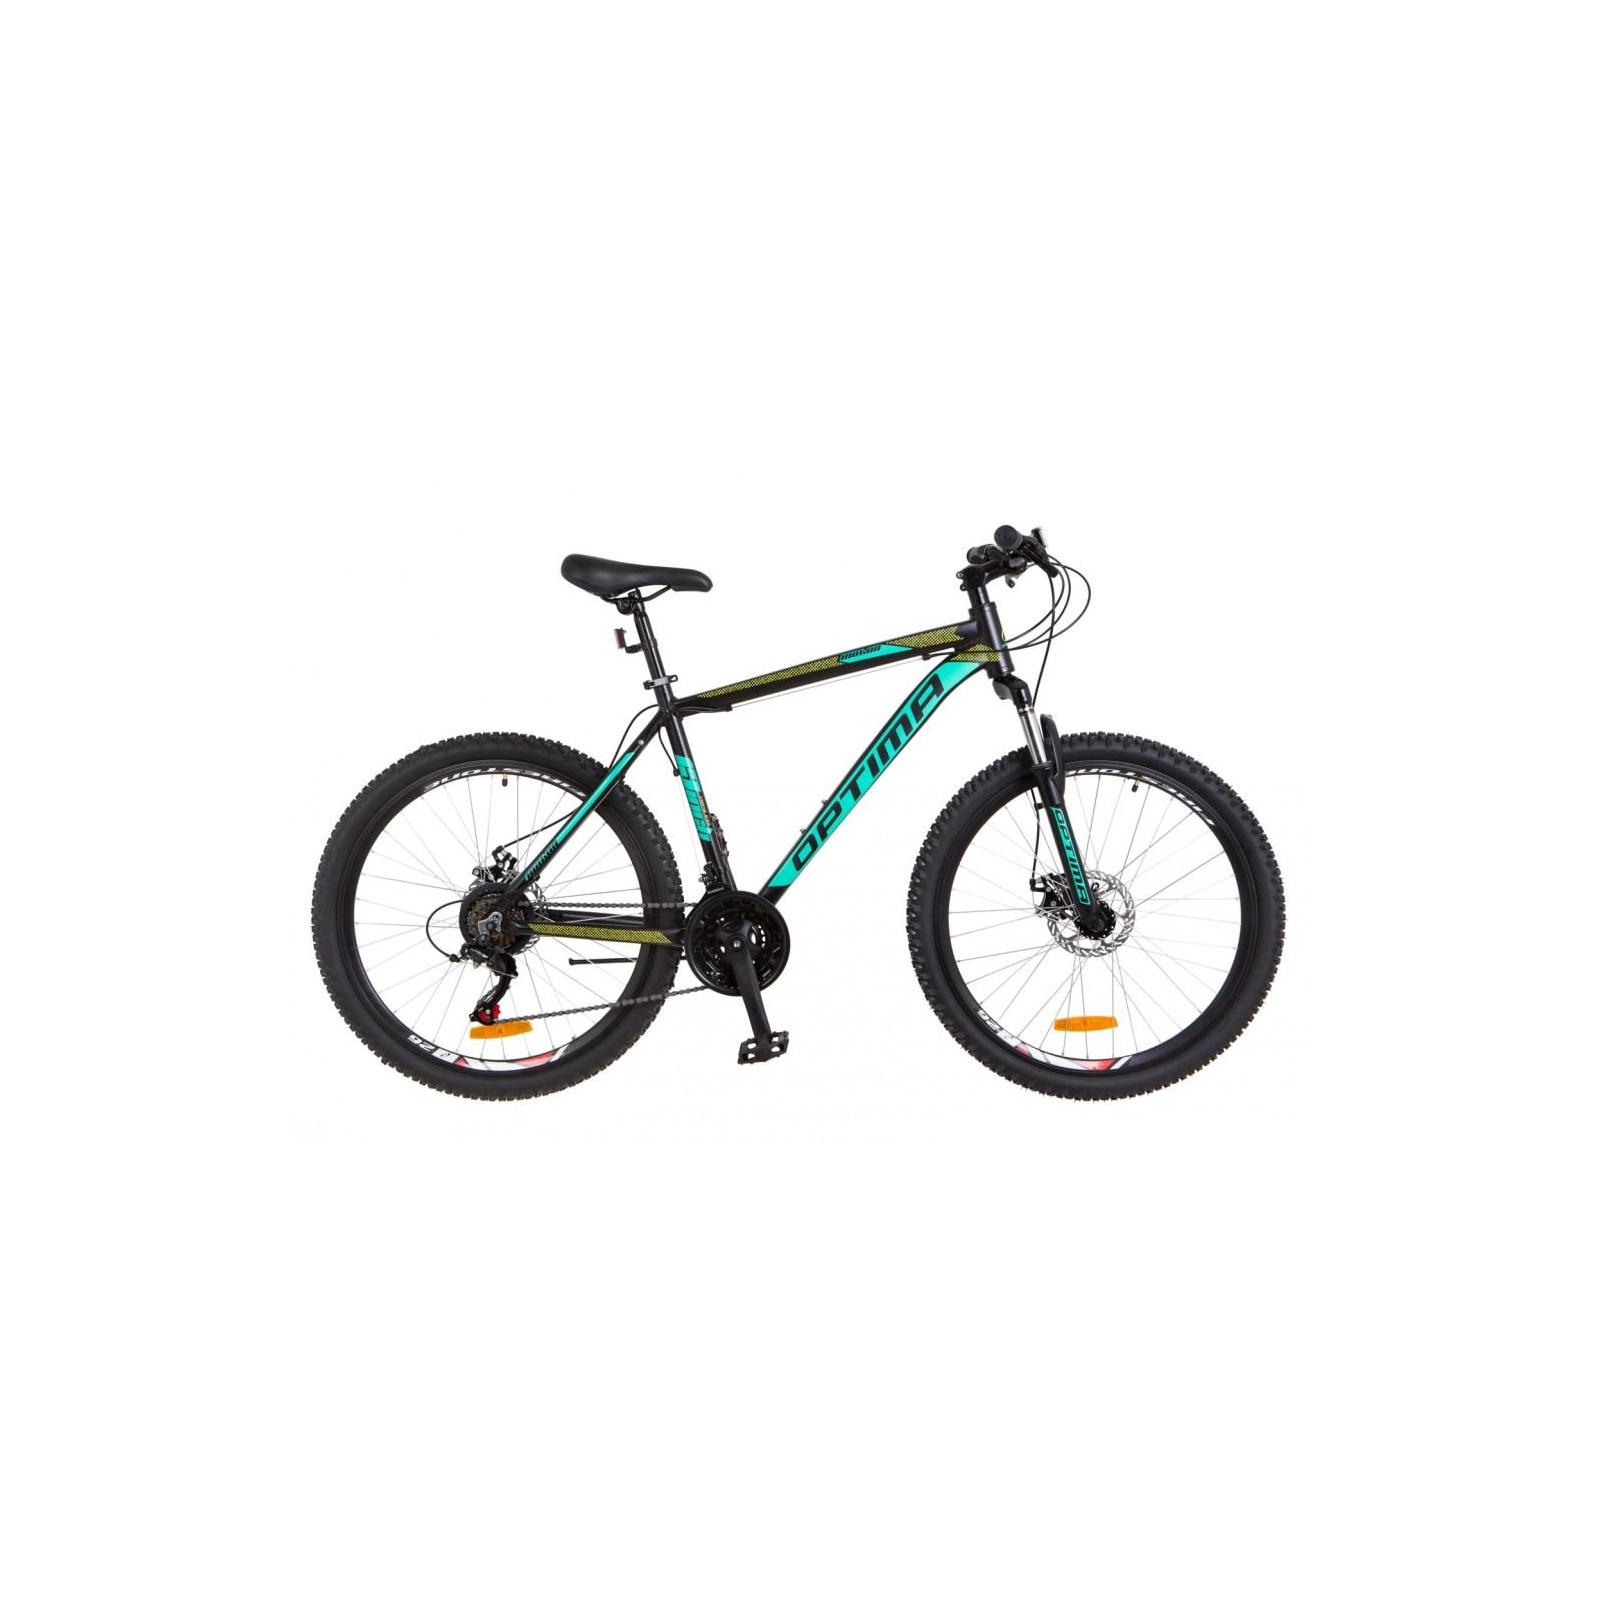 "Велосипед Optimabikes 26"" MOTION 2018 AM 14G DD рама-13"" Al черно-бирюзовый (OPS-OP-26-112)"